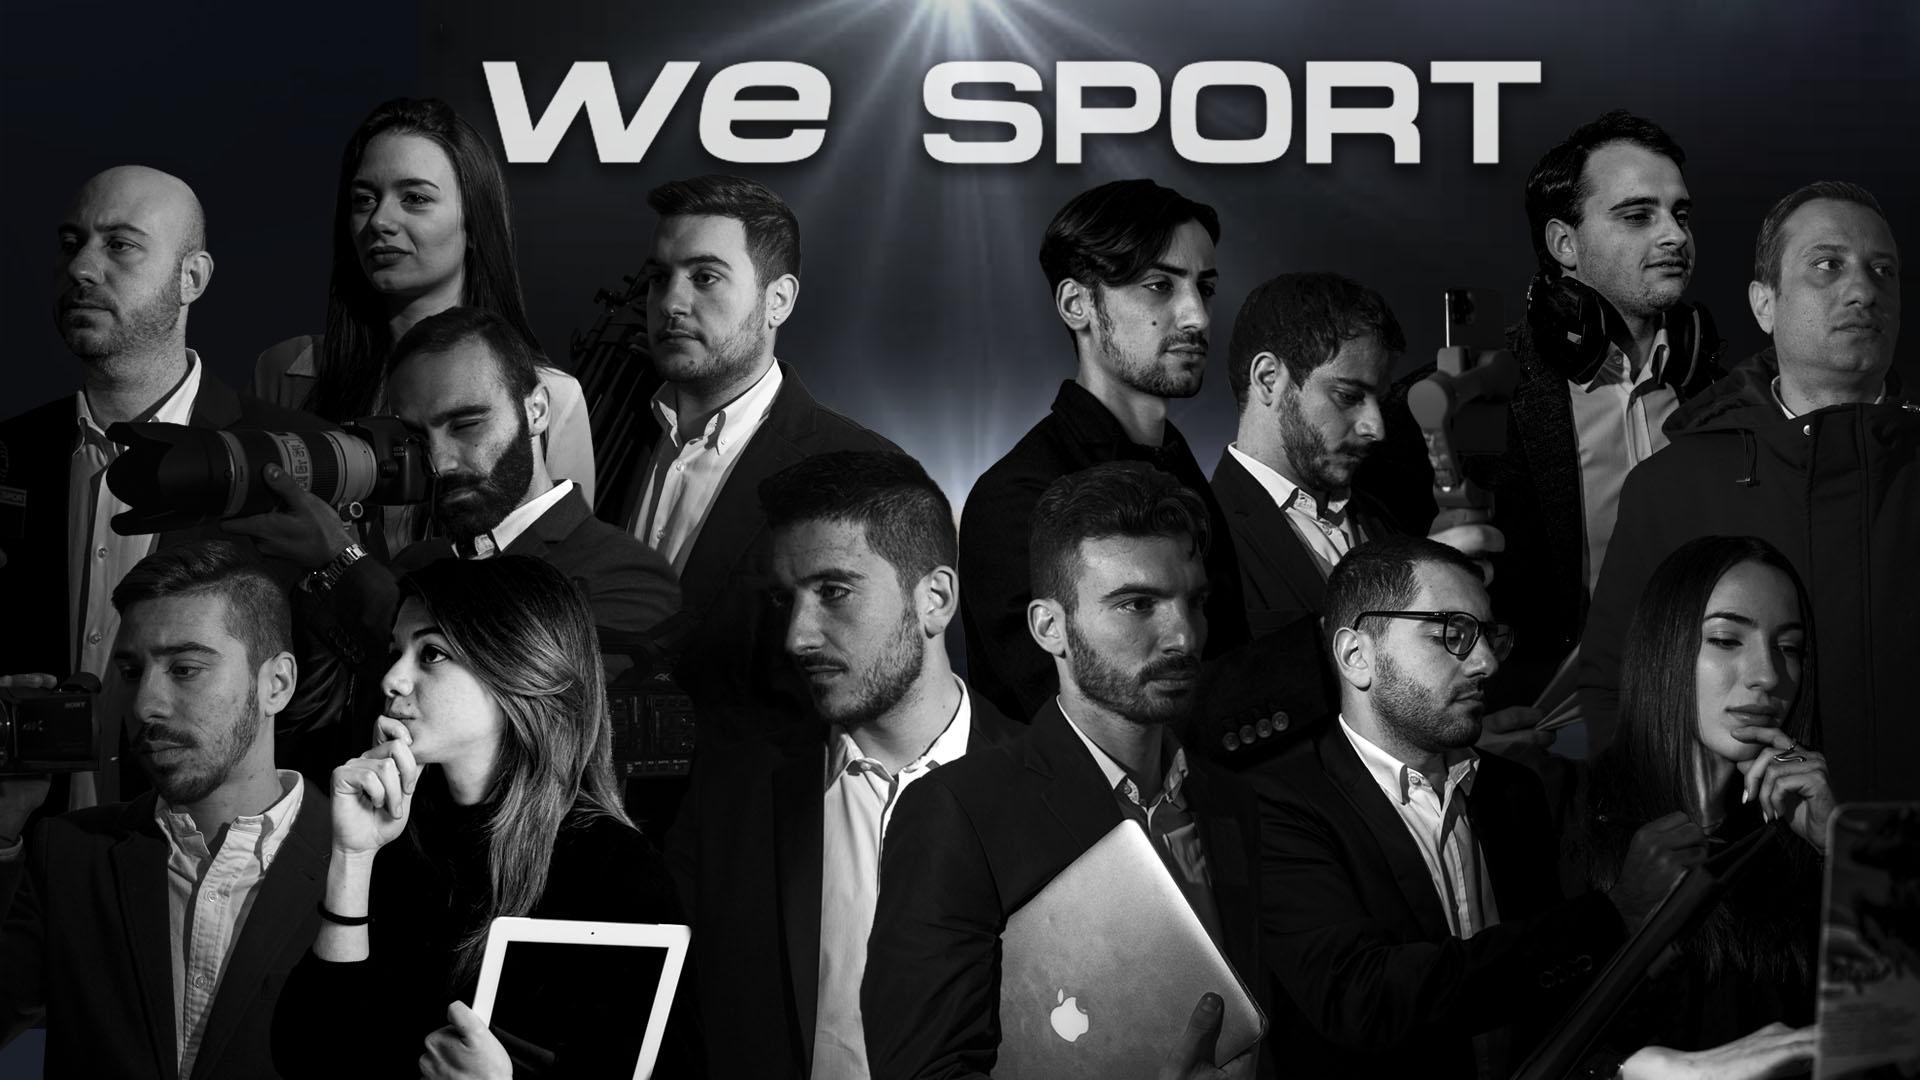 Il Team - Wesport